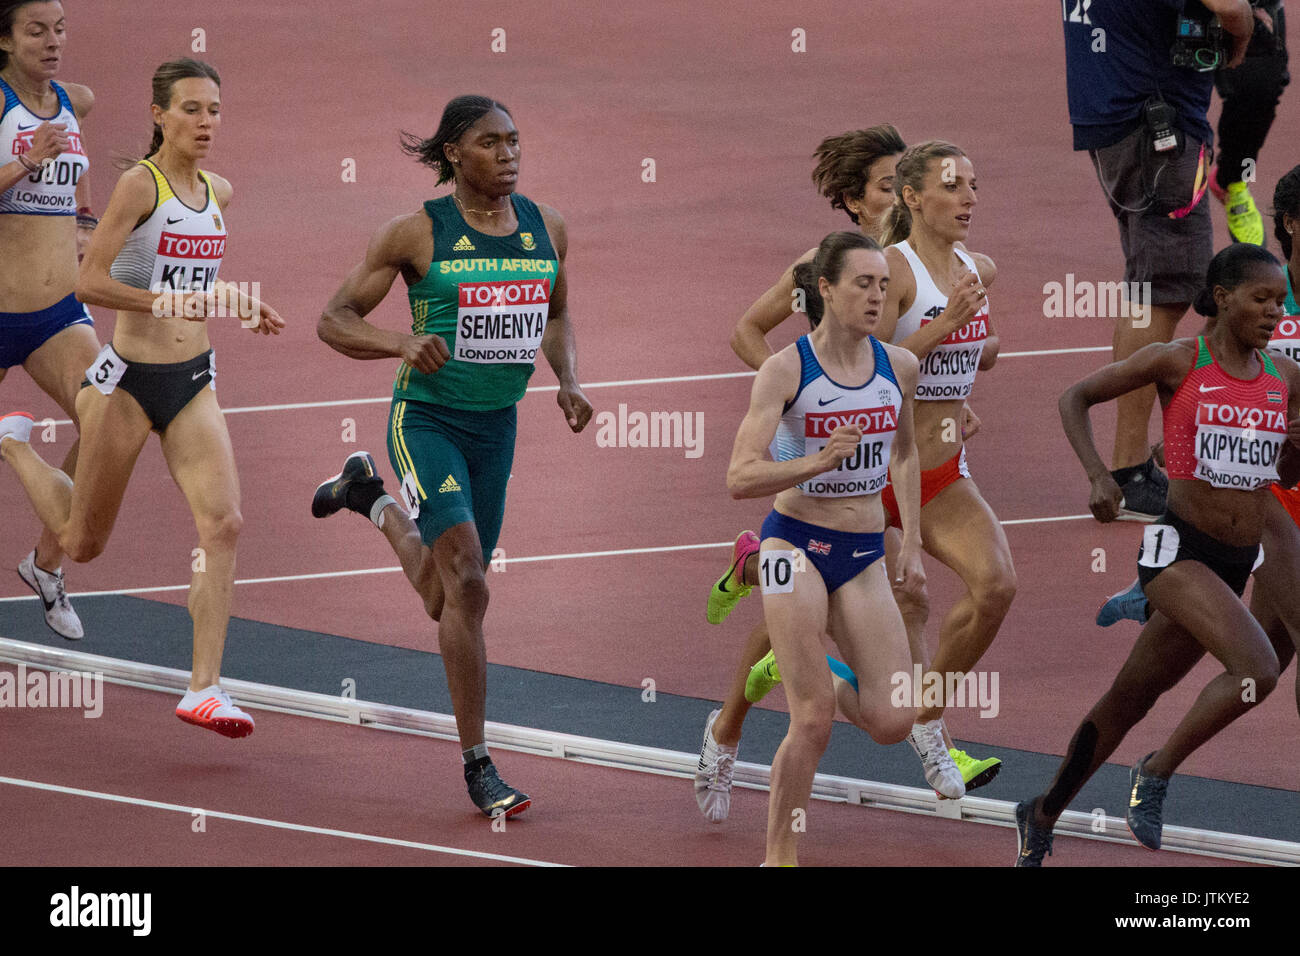 IAAF world athletic Championships, London stadium 2017 - Stock Image